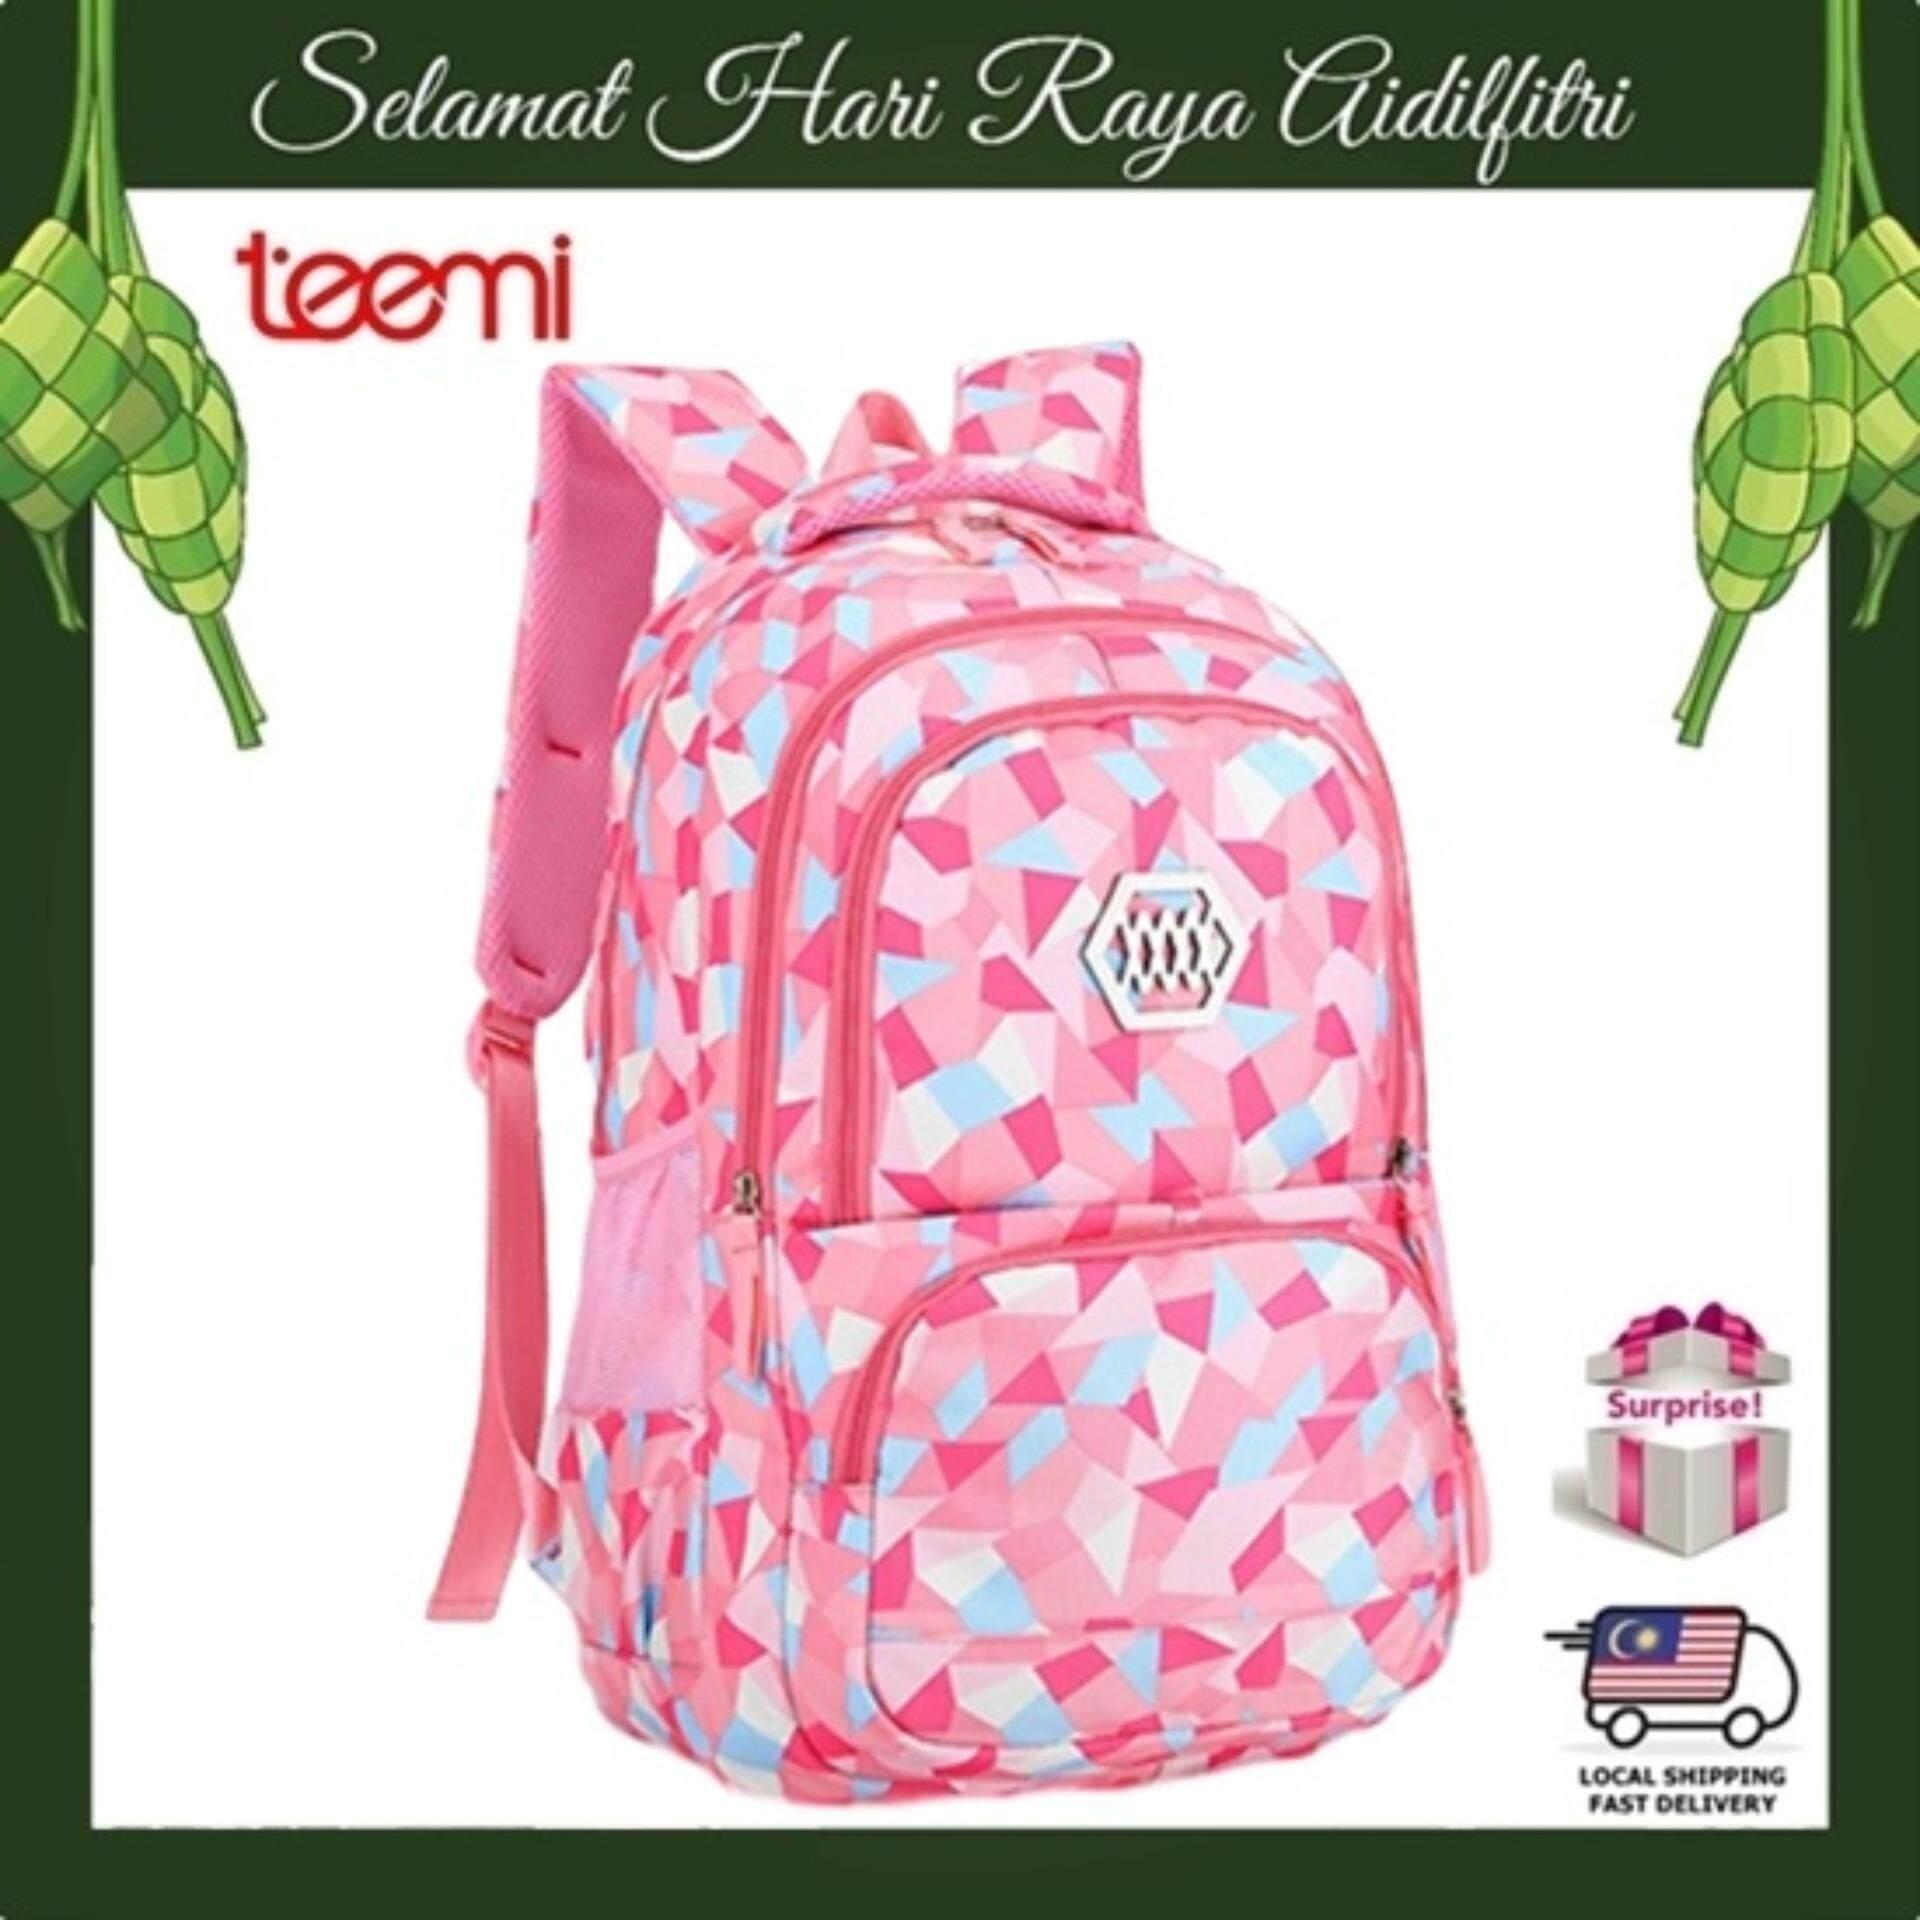 TEEMI Girls Pinkish Primary Secondary Nylon Orthopedic School Bag Kids Children Laptop Backpack - Soft Pink